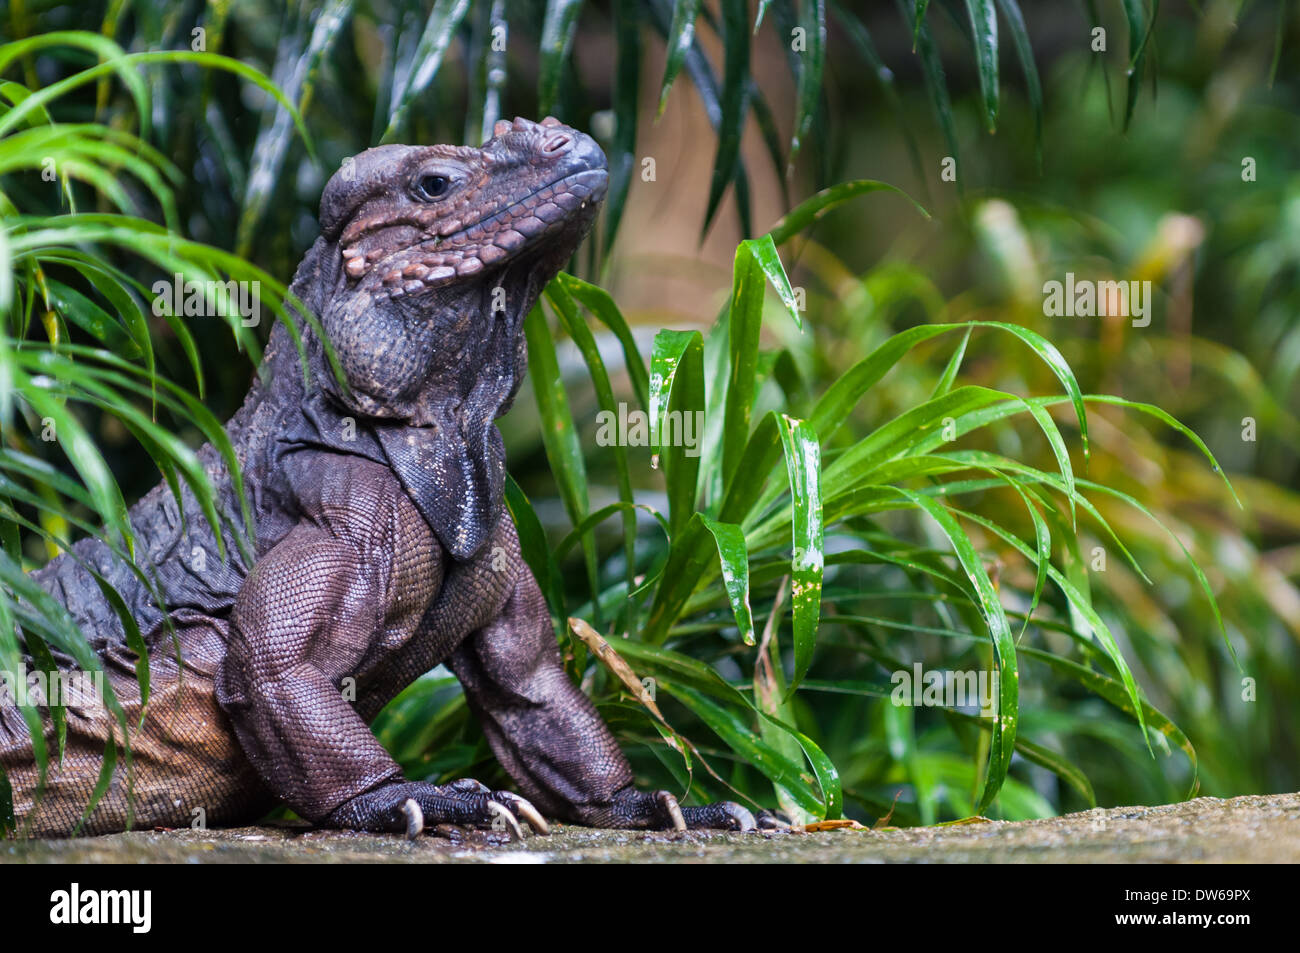 A rhinoceros iguana (cyclura cornuta) basks in the sunlight on a rock at the Singapore Zoo. - Stock Image